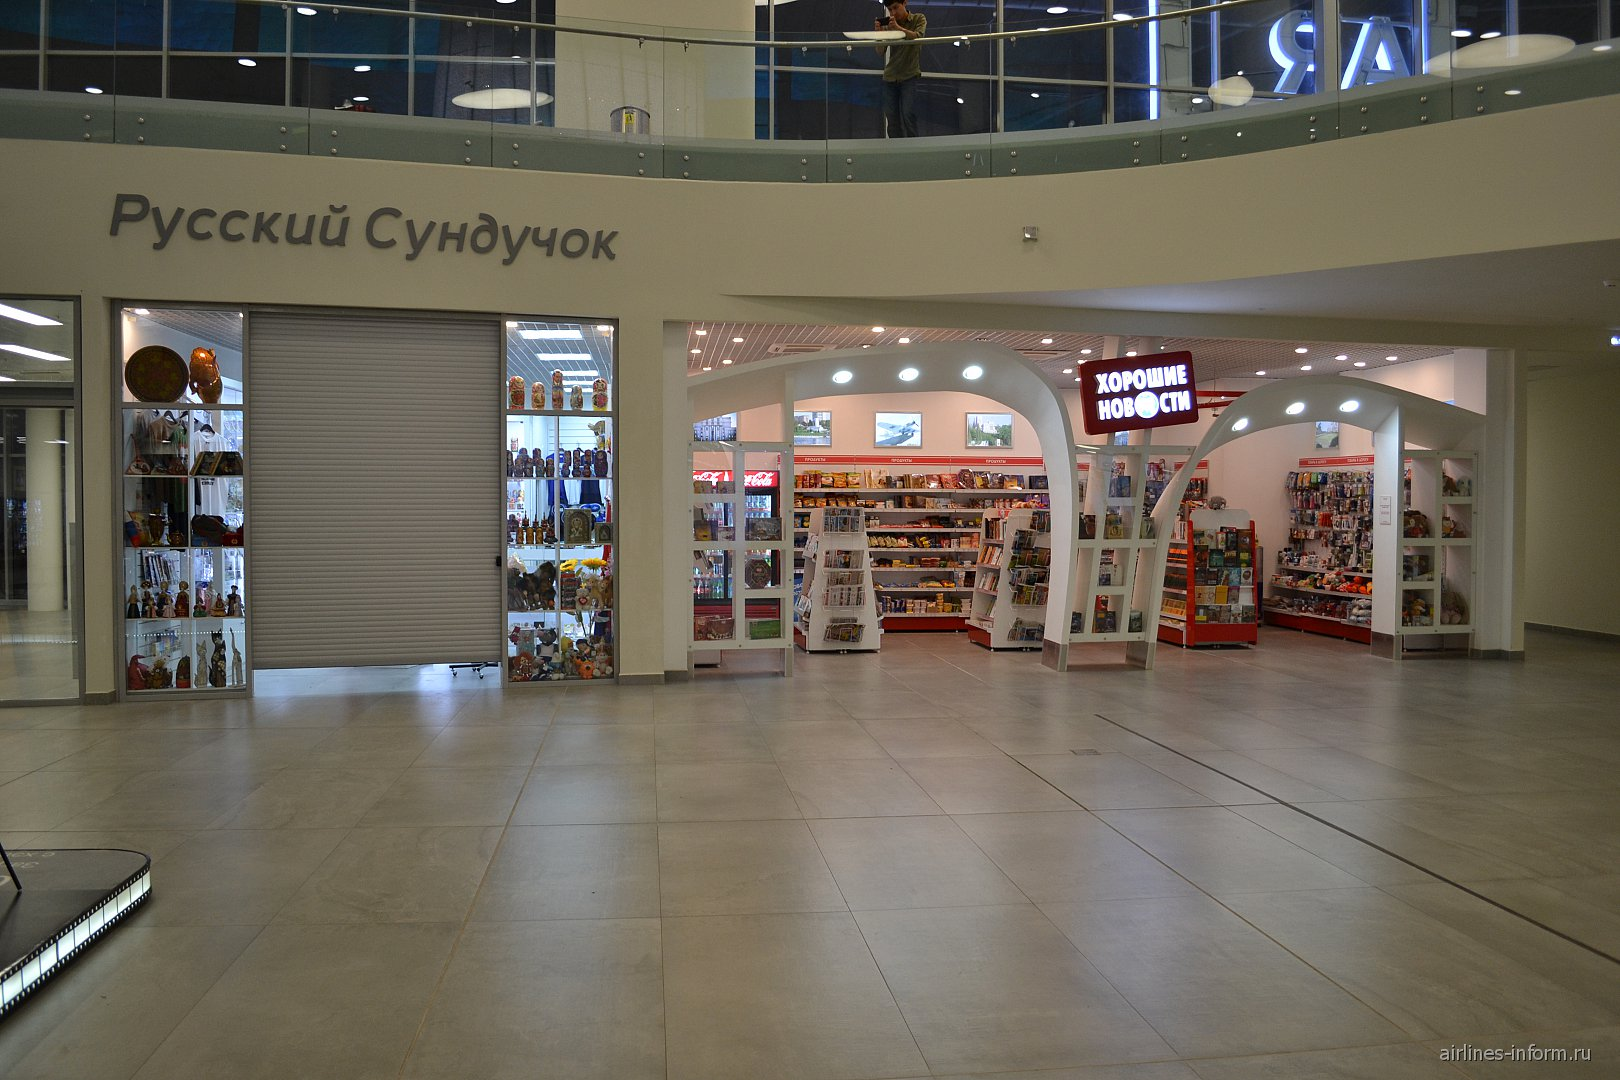 Магазины в аэропорту Самара Курумоч